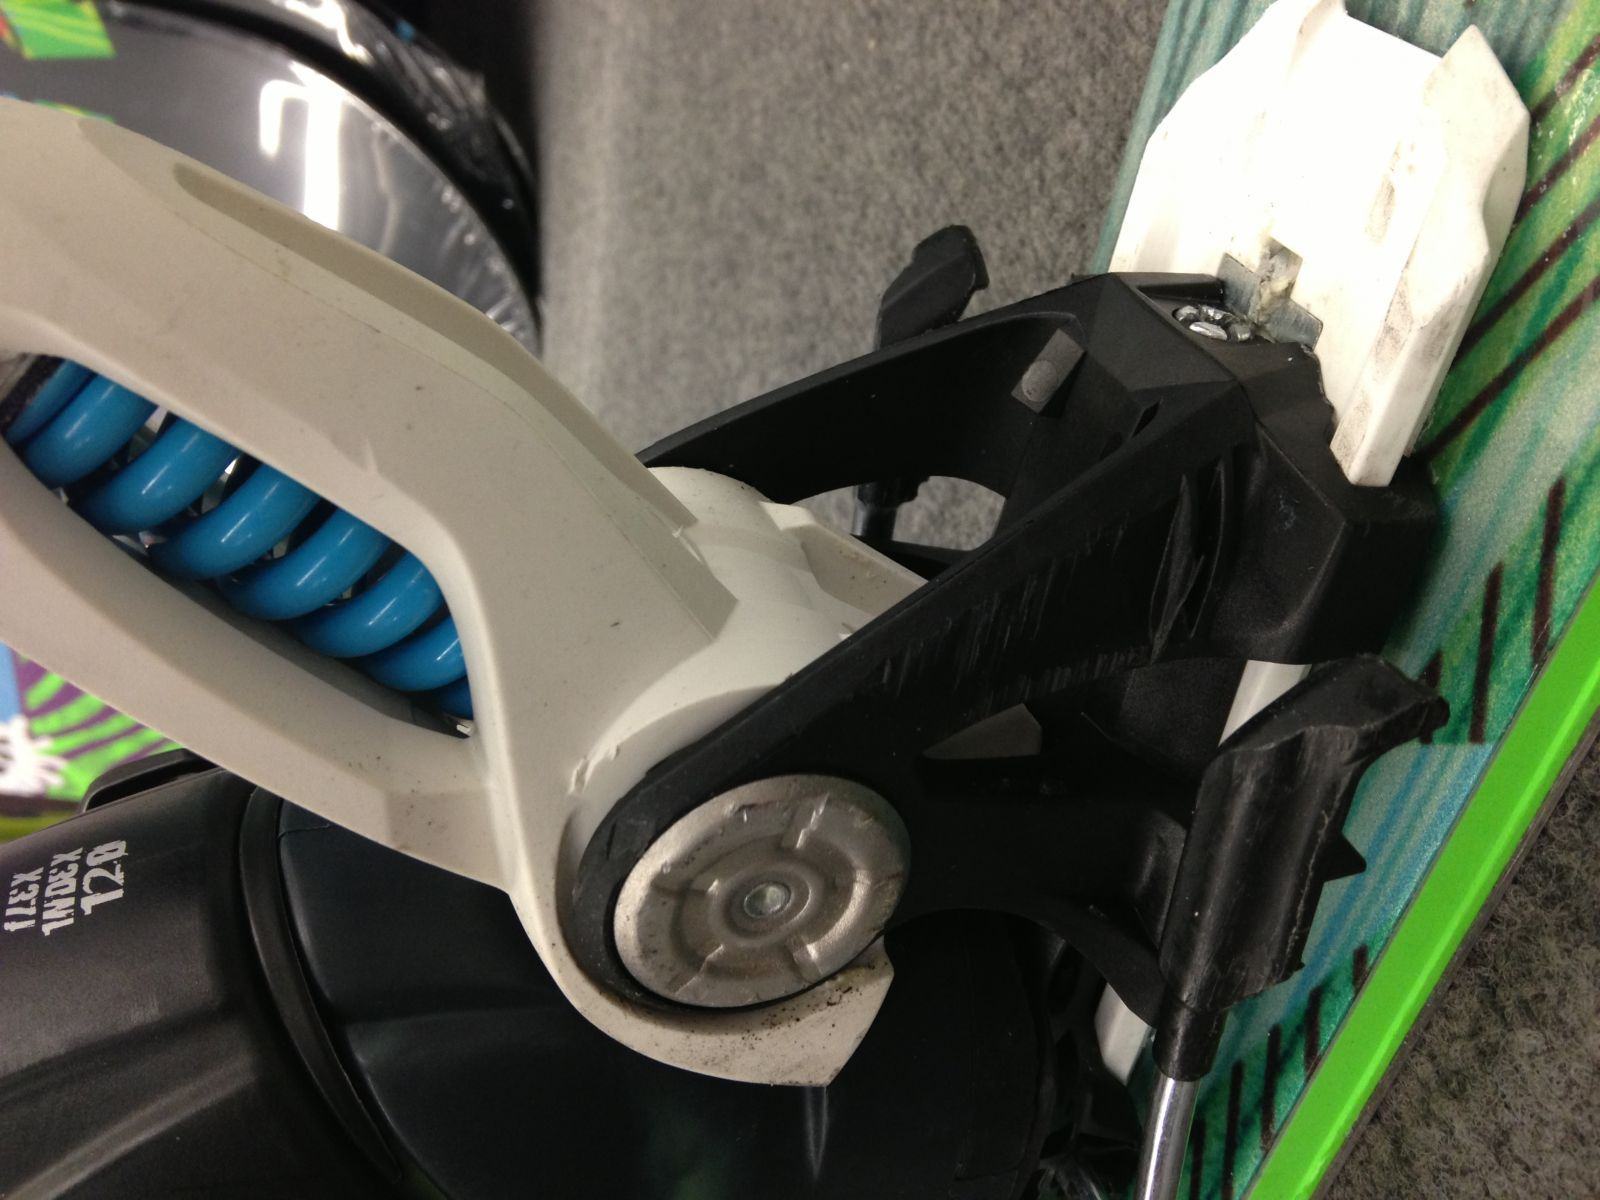 How To Adjust Your Marker Ski Bindings Ski bindings